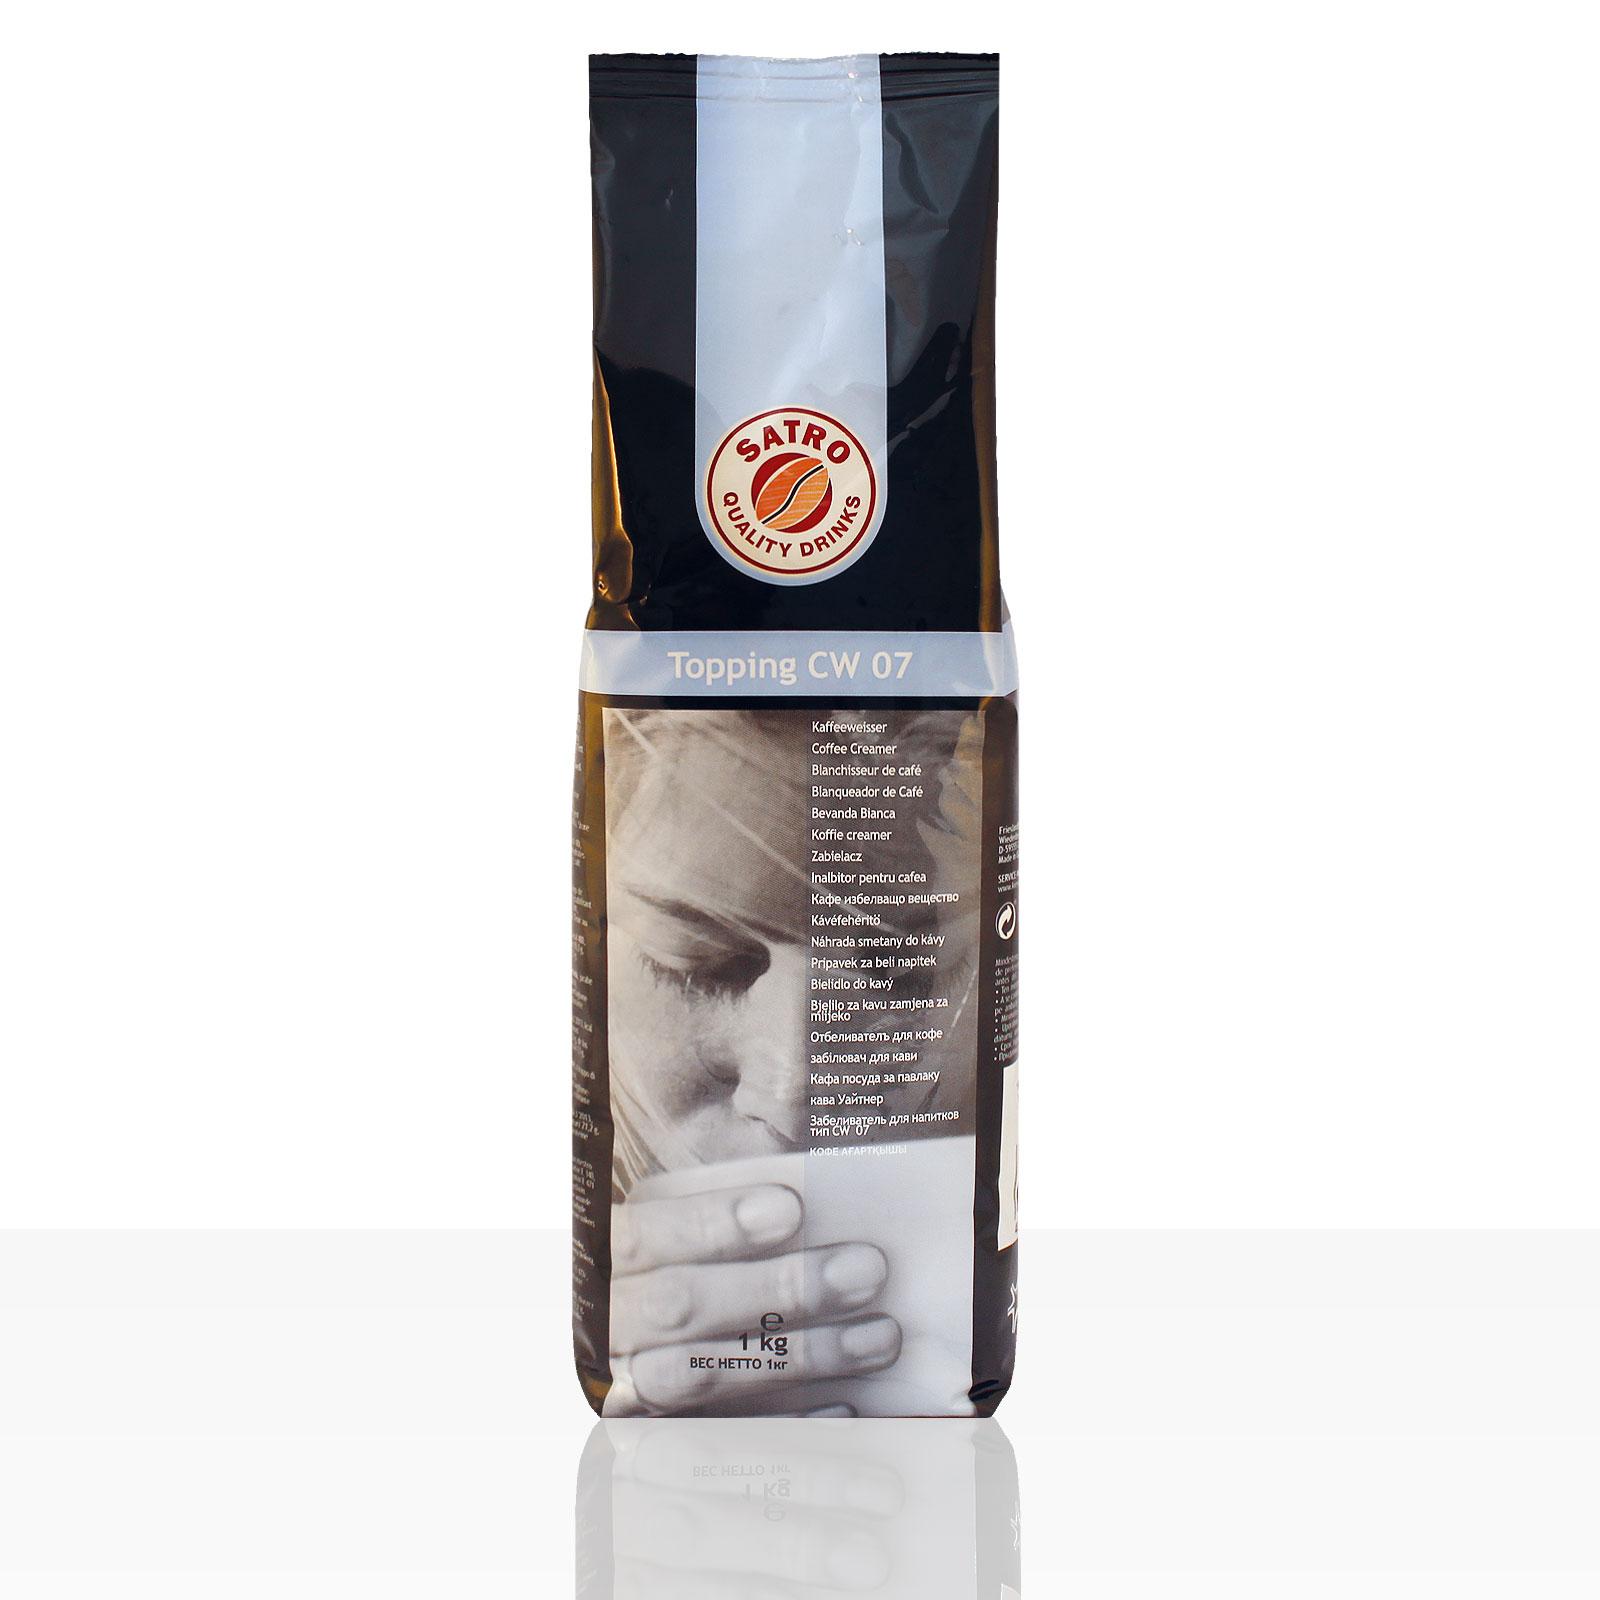 Satro Topping CW 07 Kaffeeweisser - 10 x 1kg